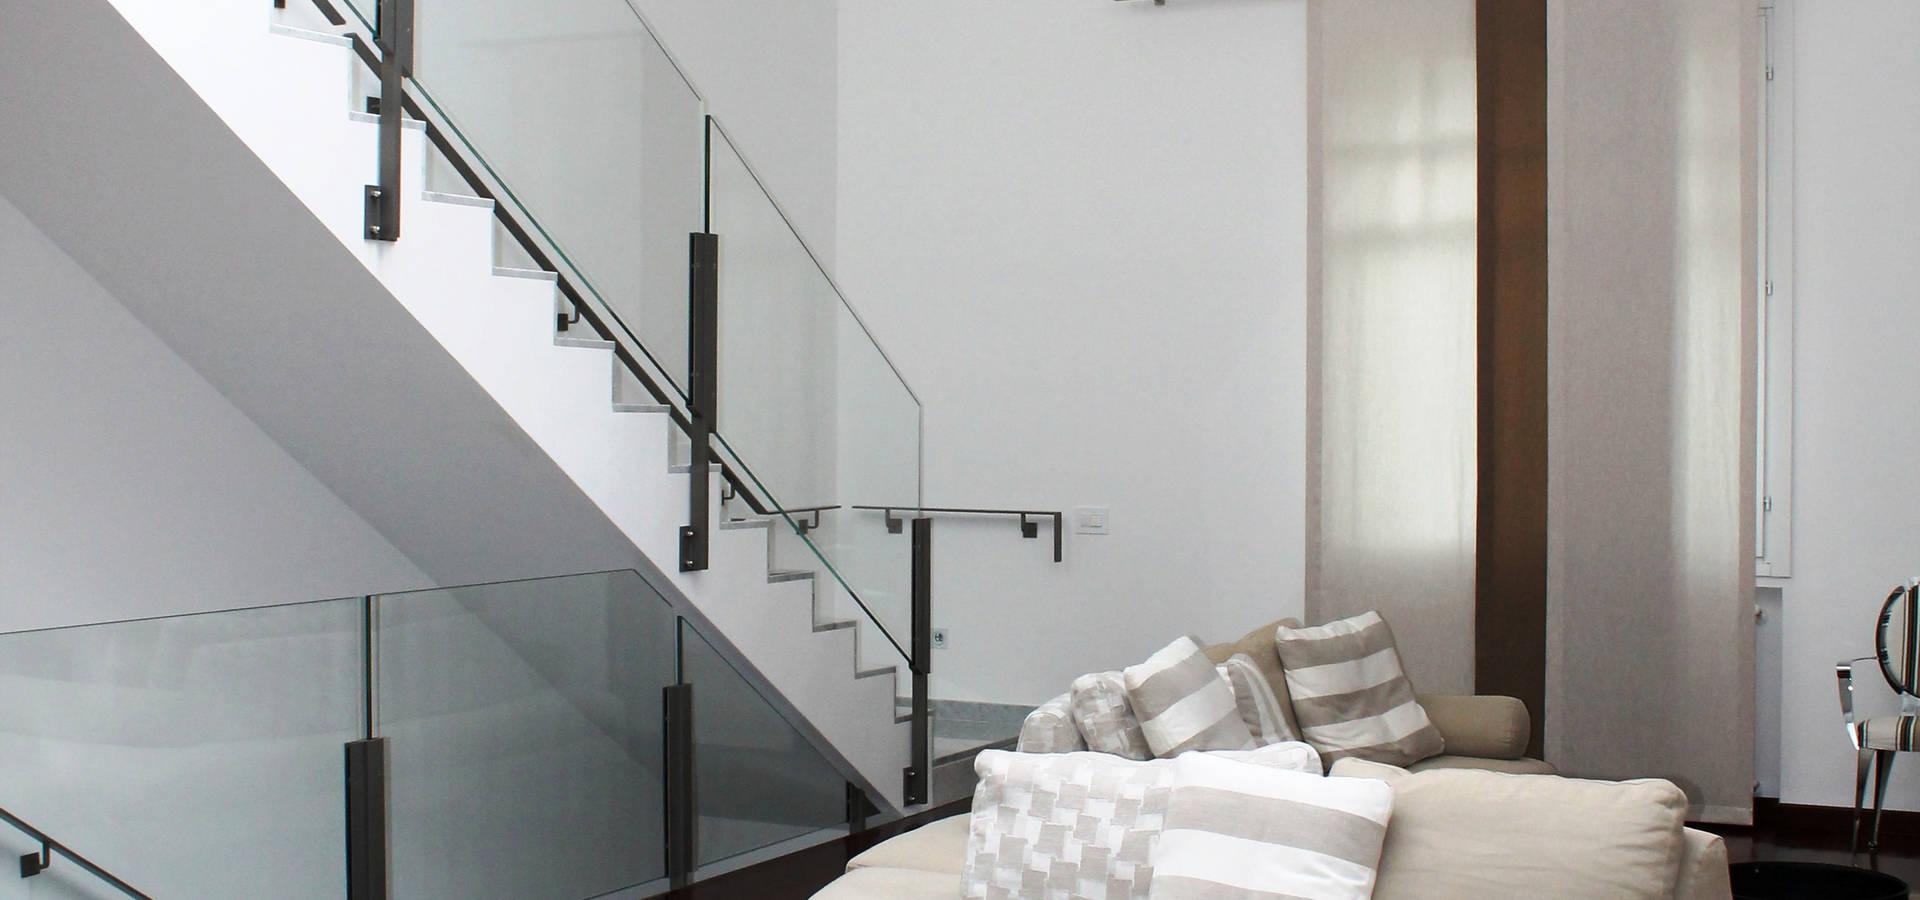 Zenith-Studio Architetti Associati